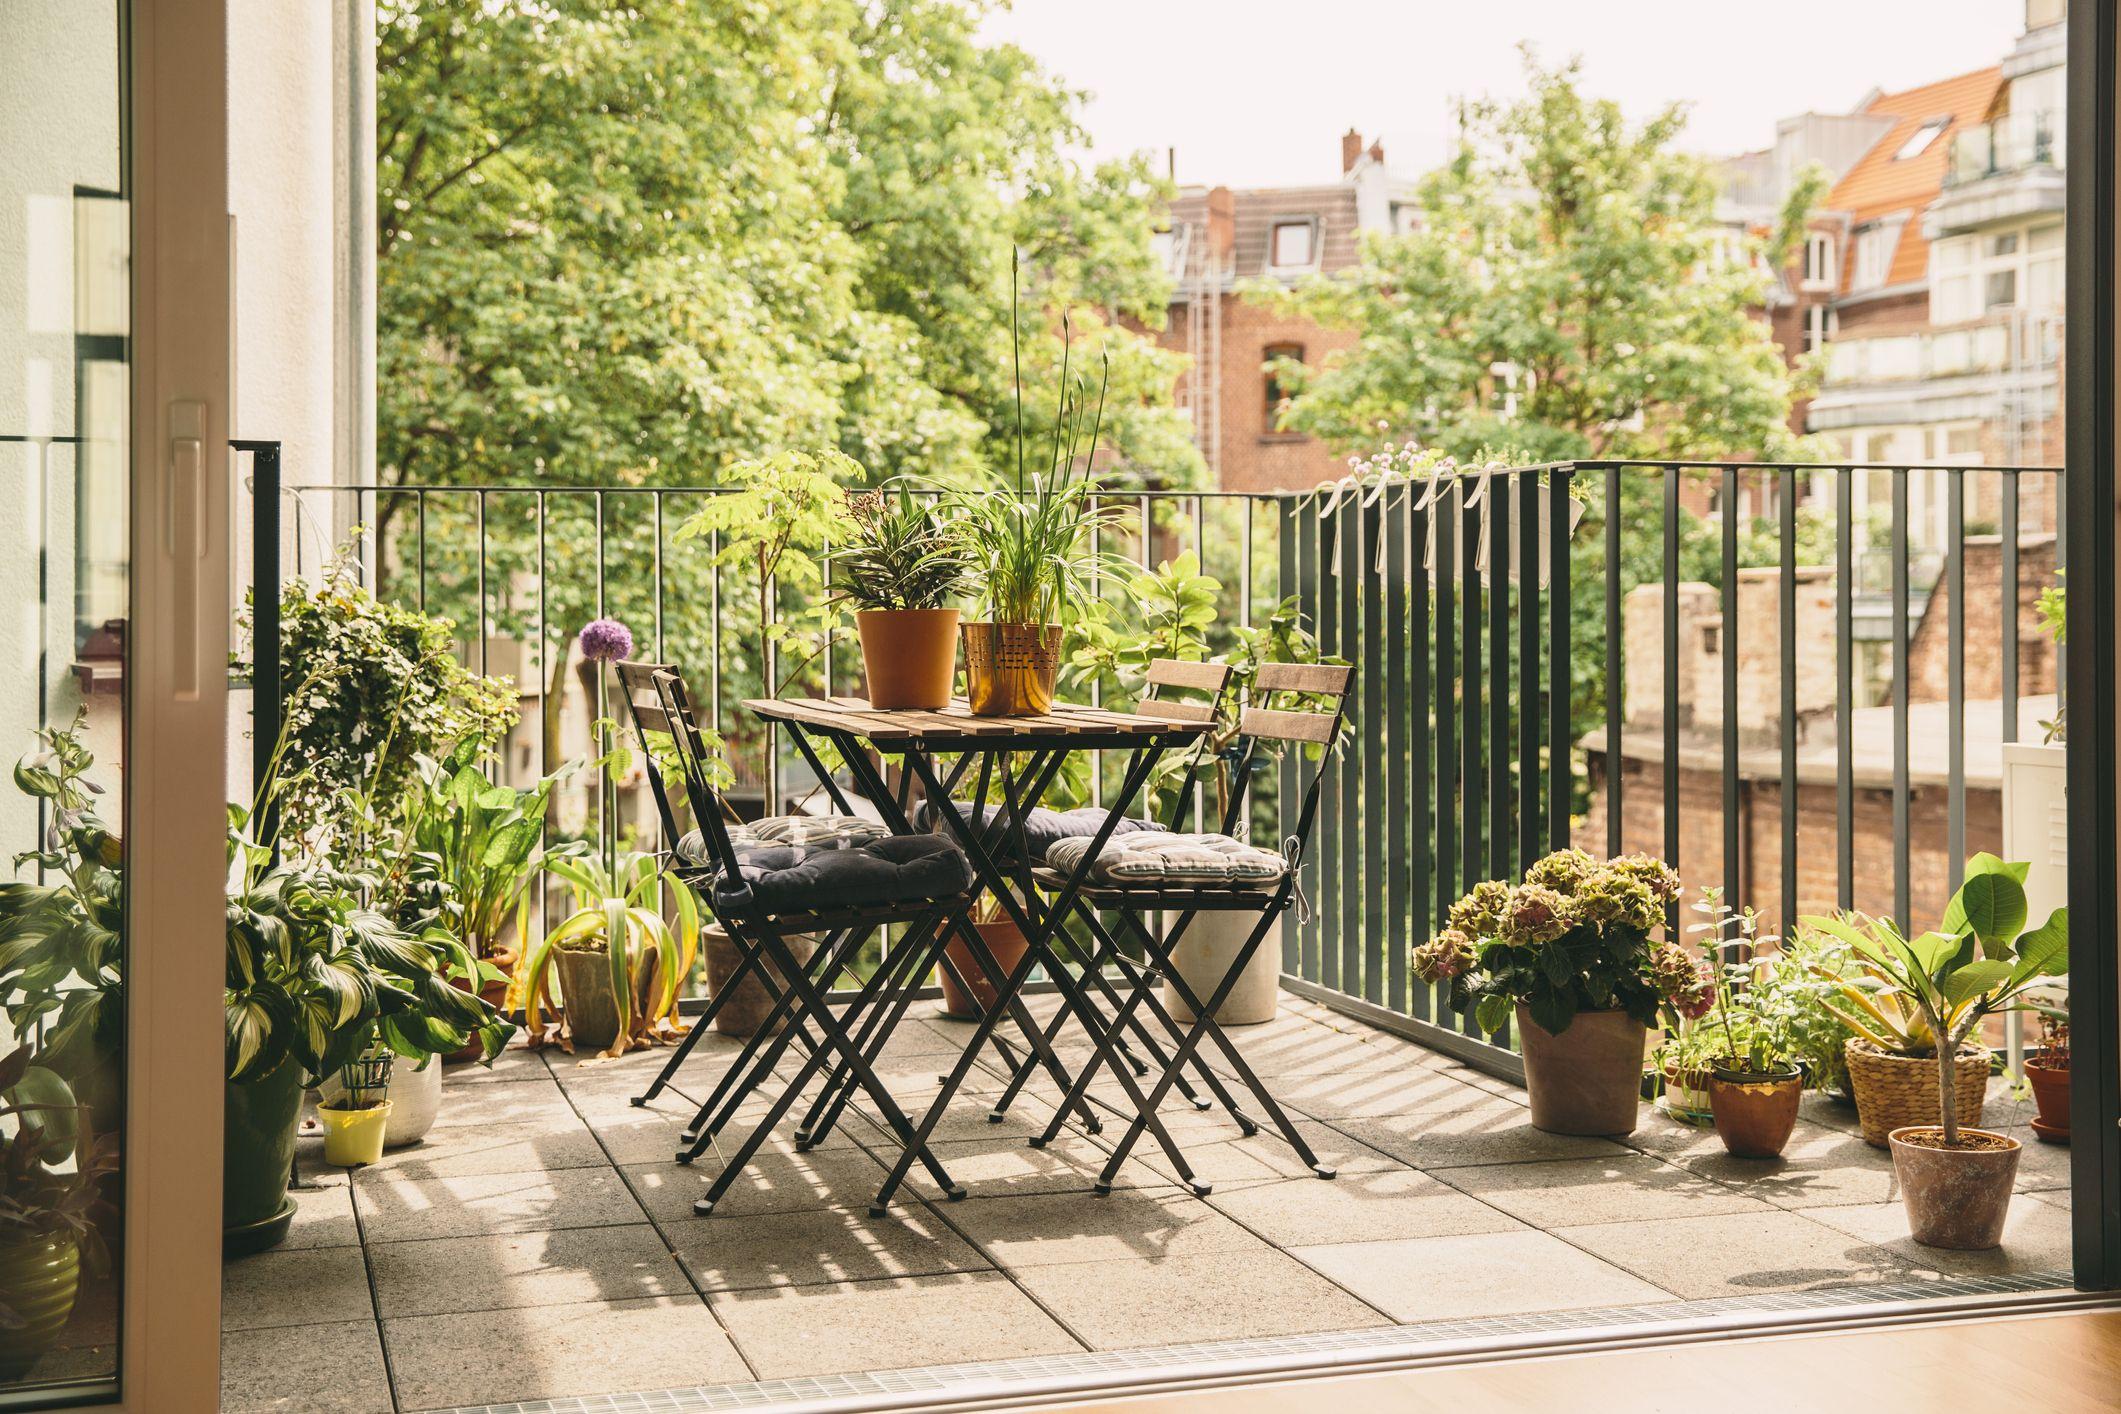 Balcony Ideas - How To Decorate A Balcony Garden